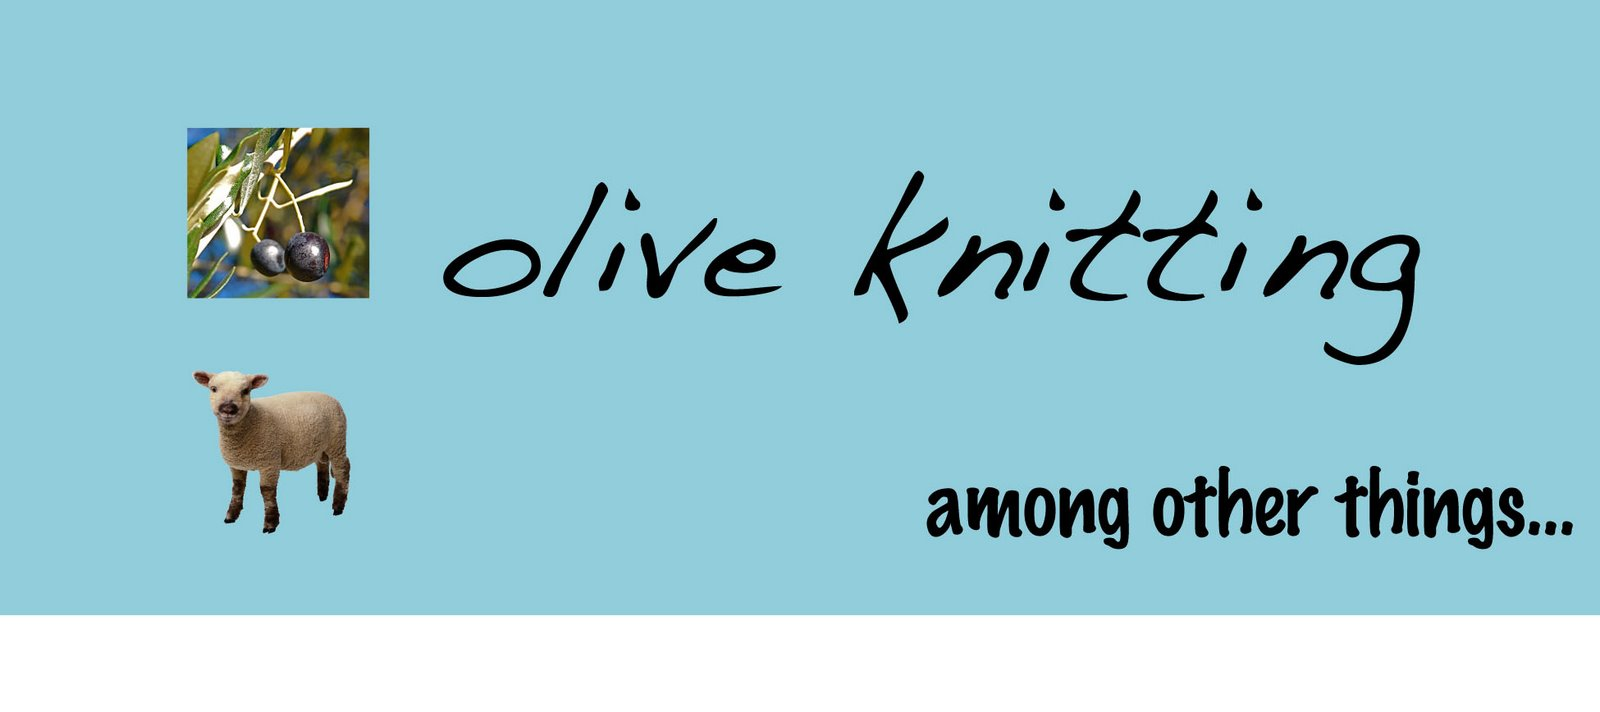 Olive Knitting